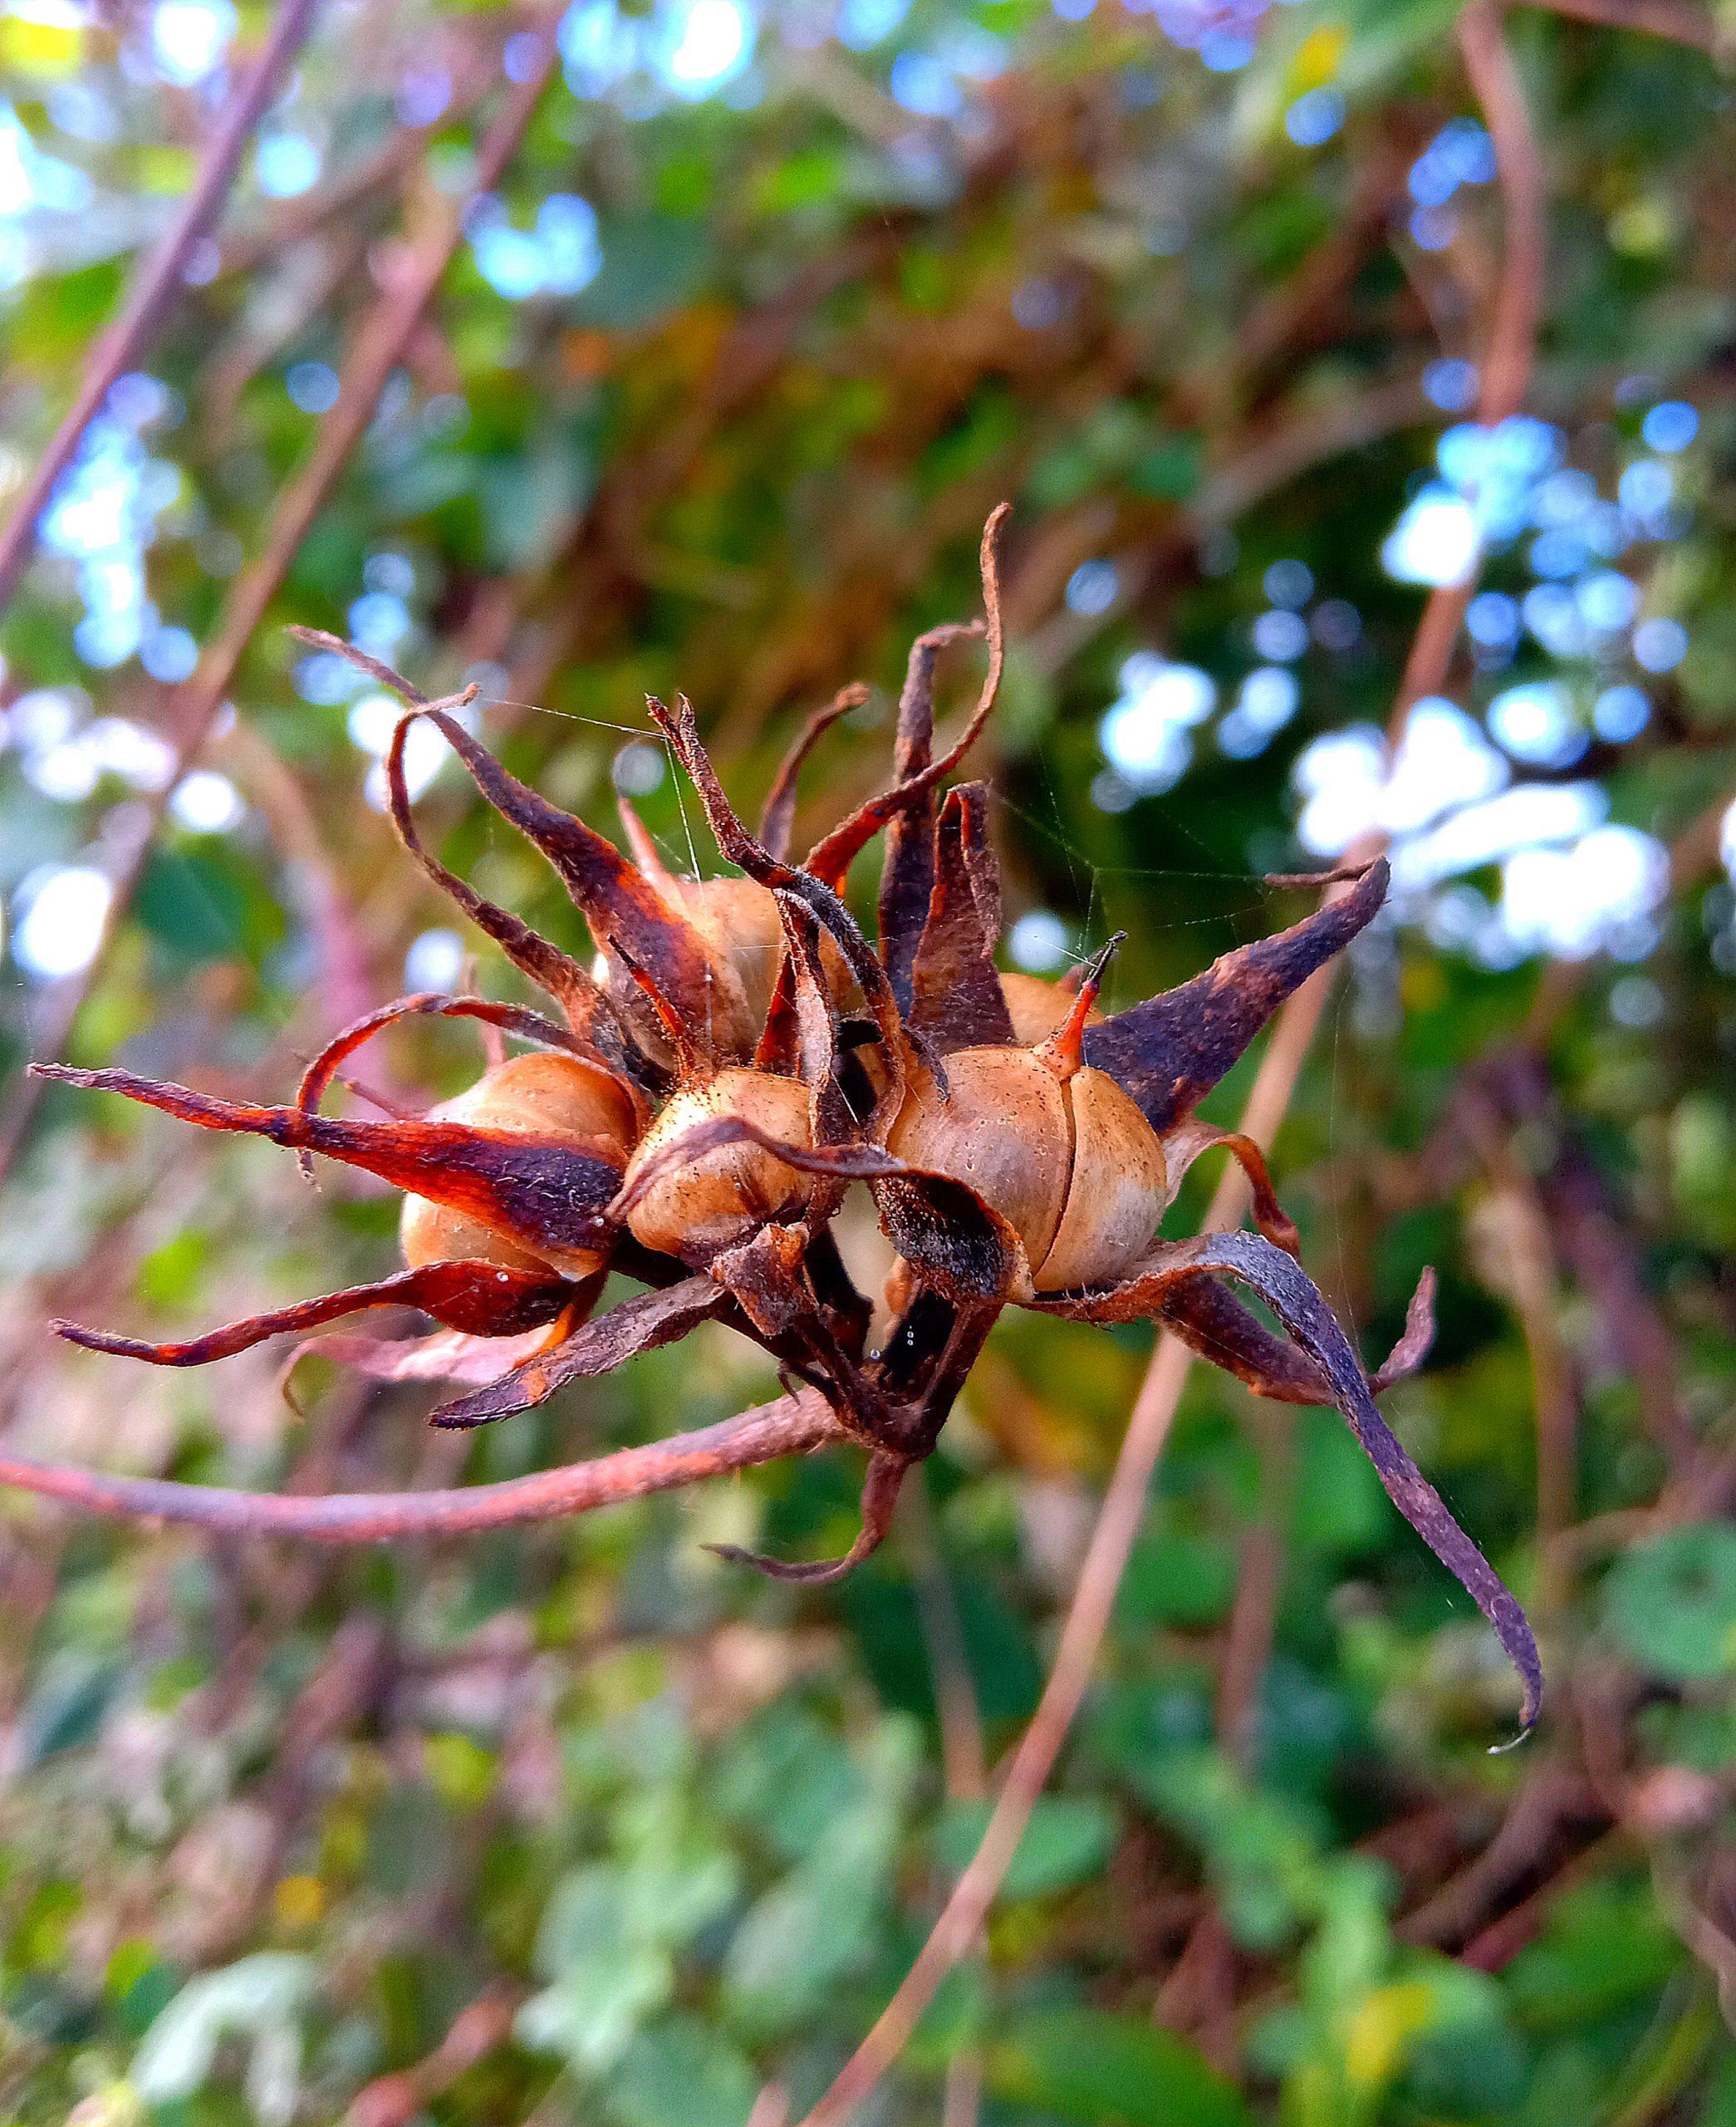 Cotton plant buds